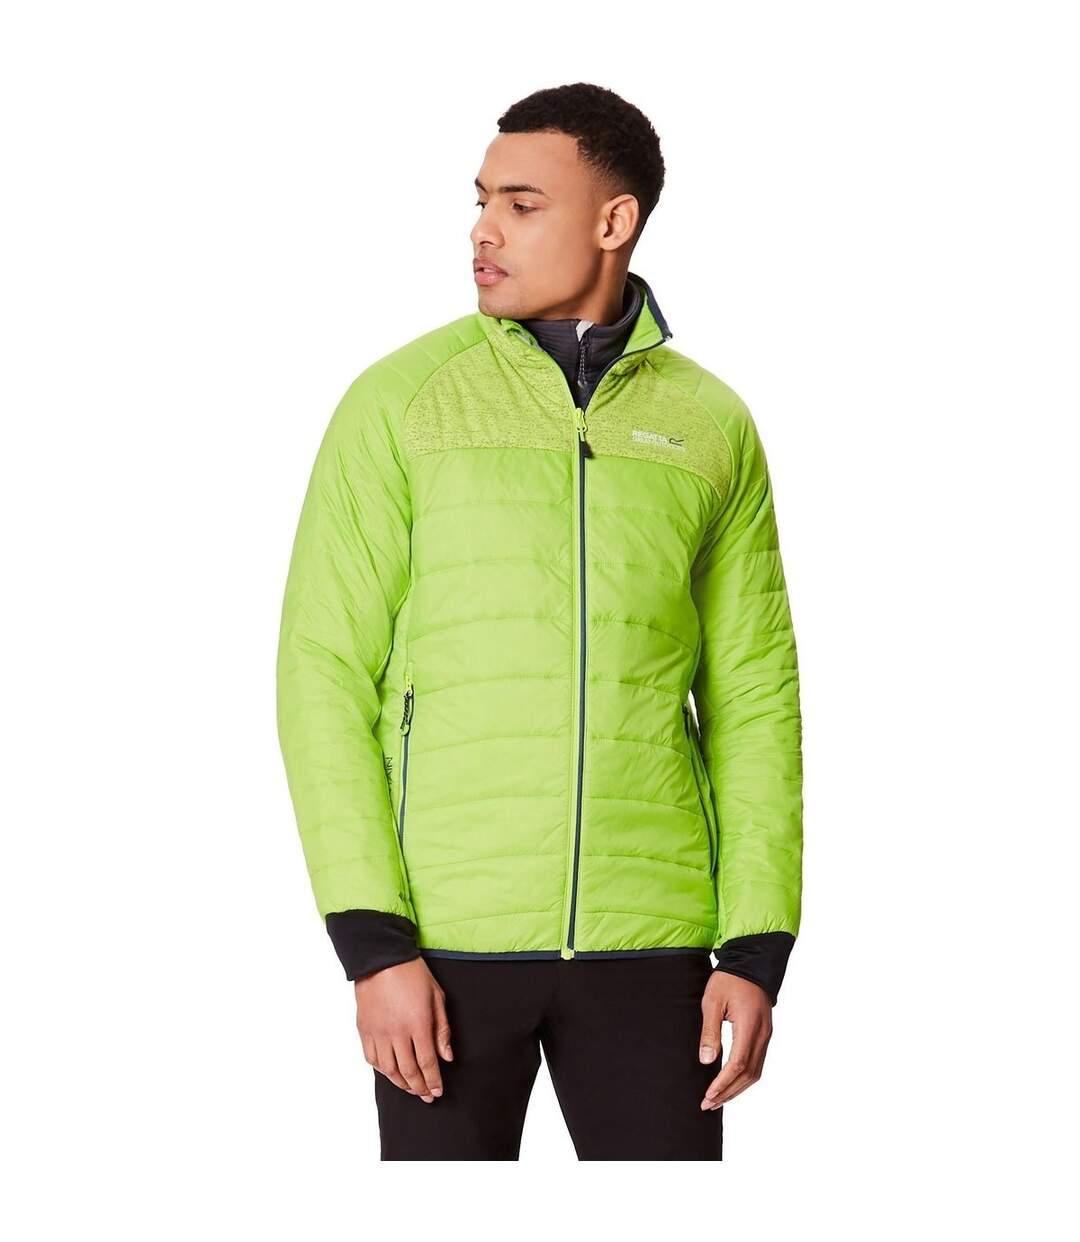 Regatta Mens Halton II Full Zip Jacket (Lemon Yellow) - UTRG3671